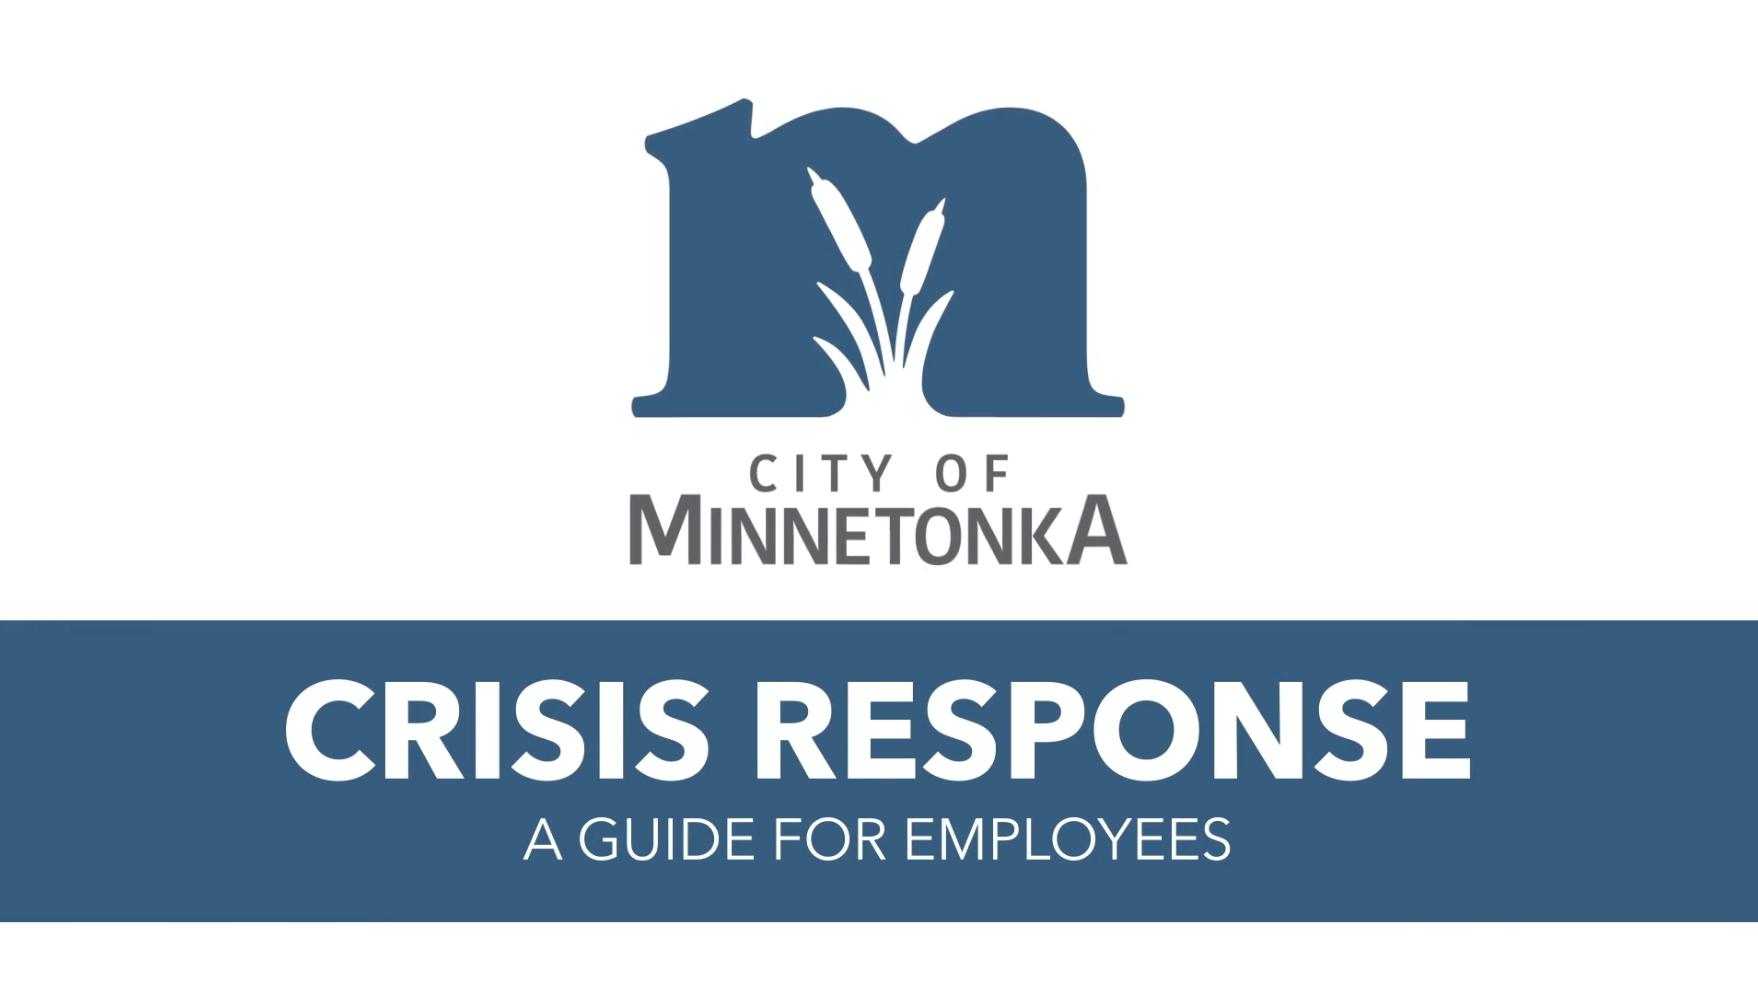 City of Minnetonka Crisis Response